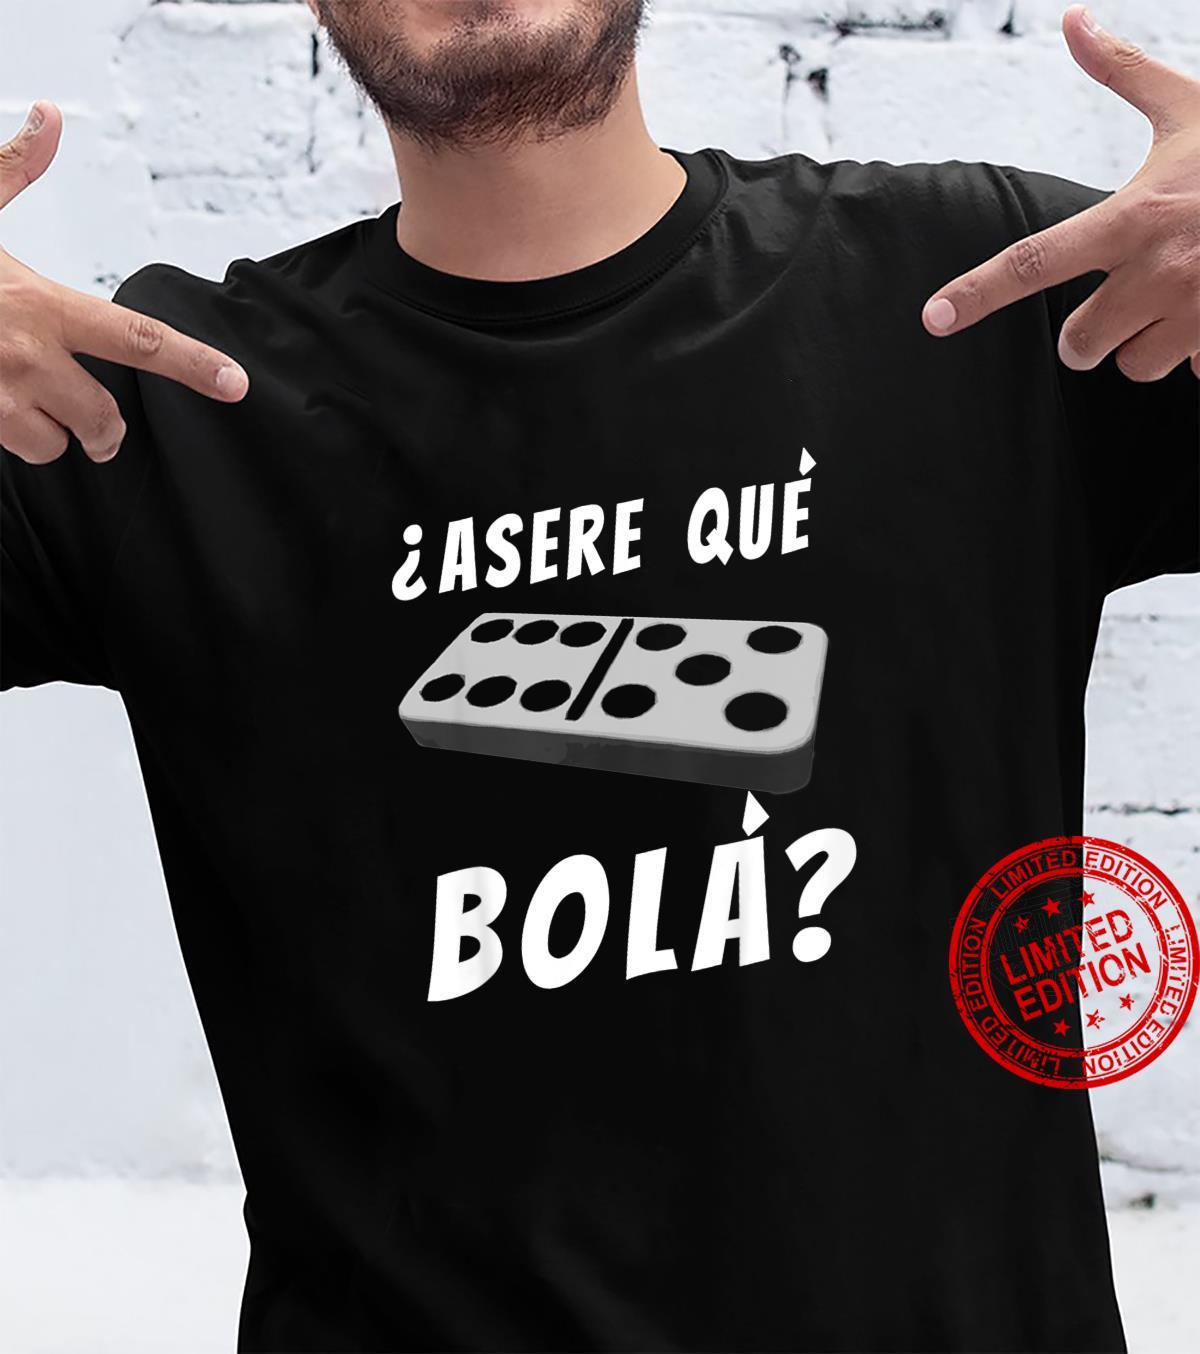 Kids Cuban Saying Miami Florida Cuba Dominoes Domino Game Shirt